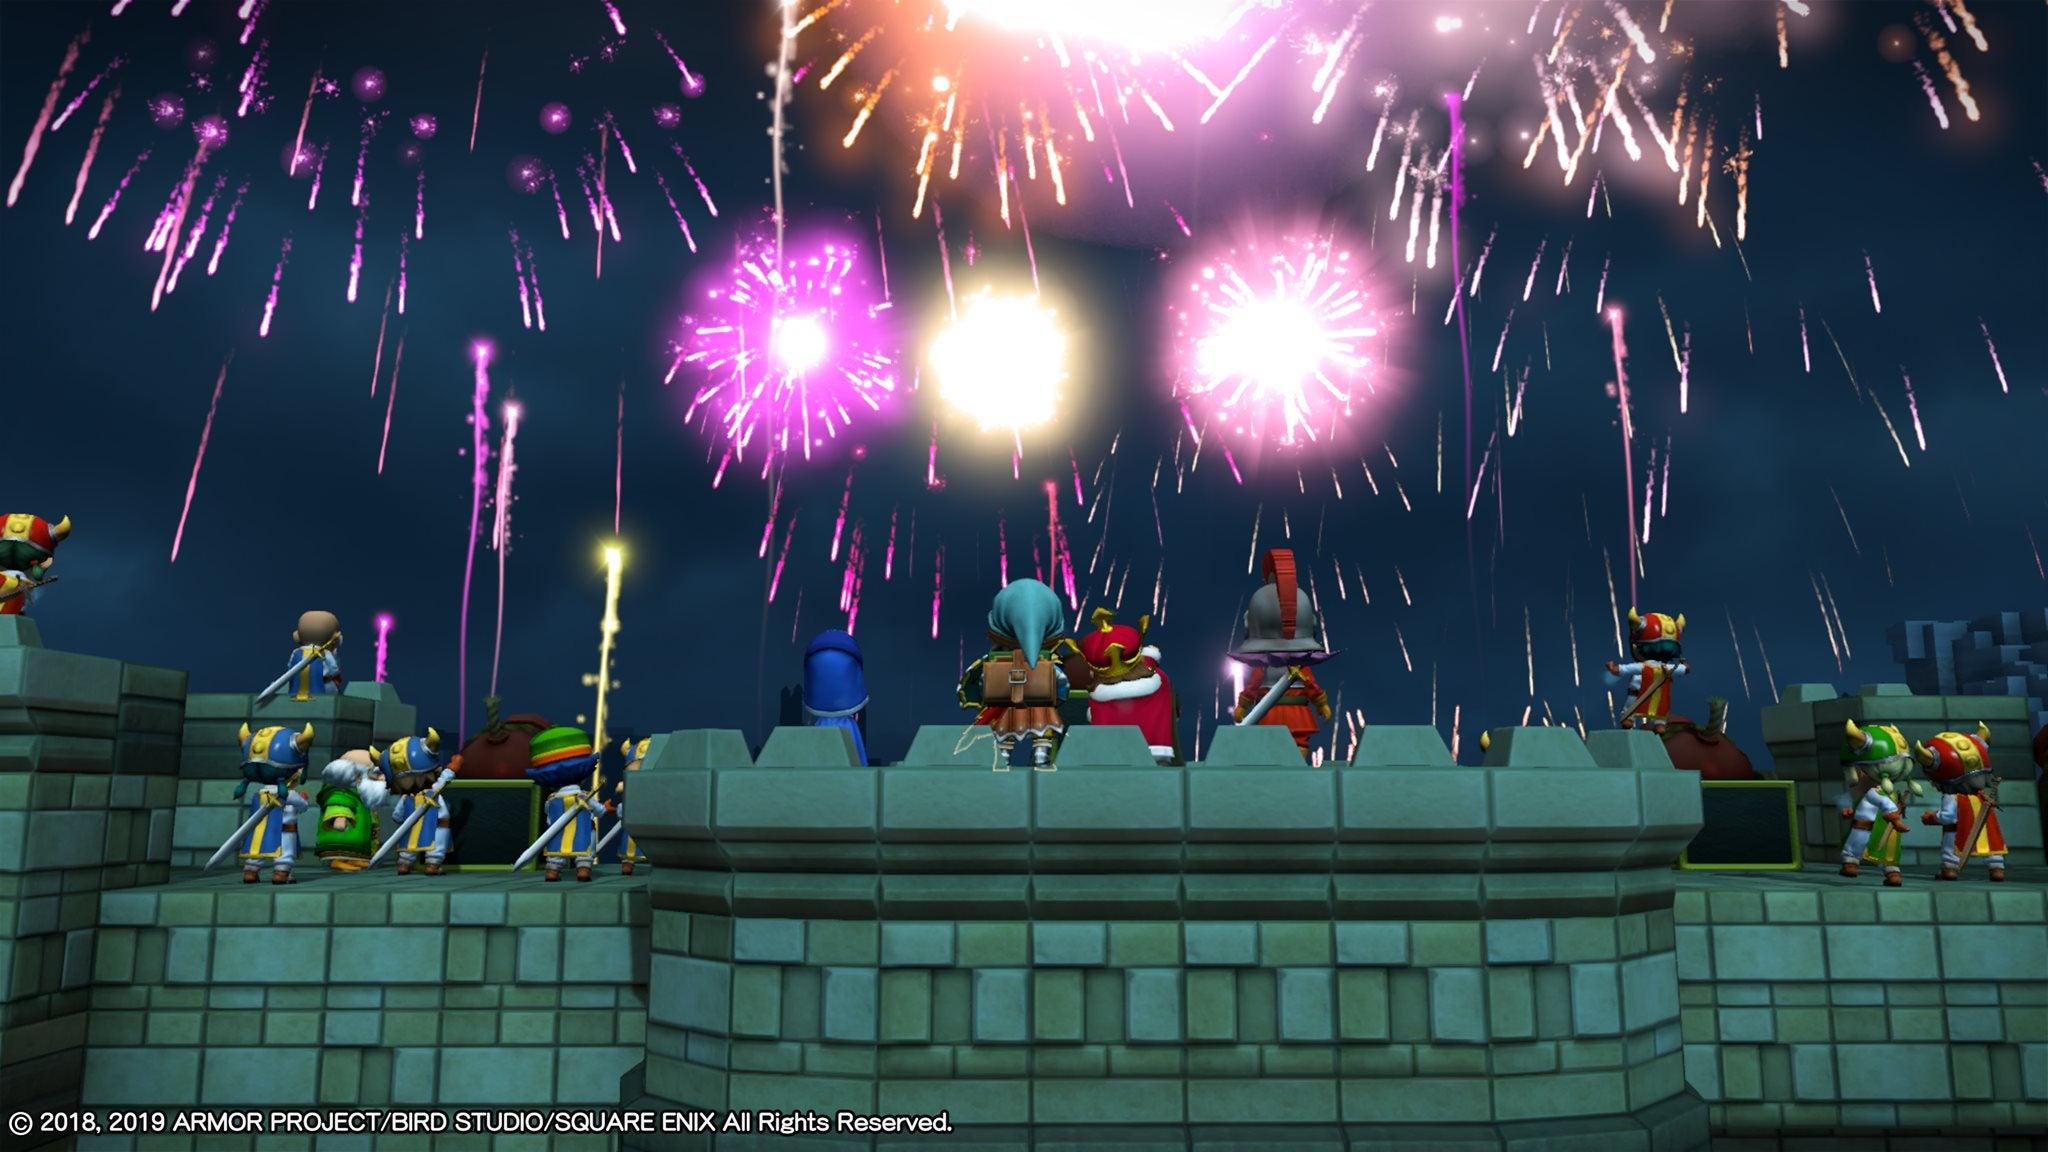 Image for Dragon Quest Builders 2 has sold 1.1 million copies